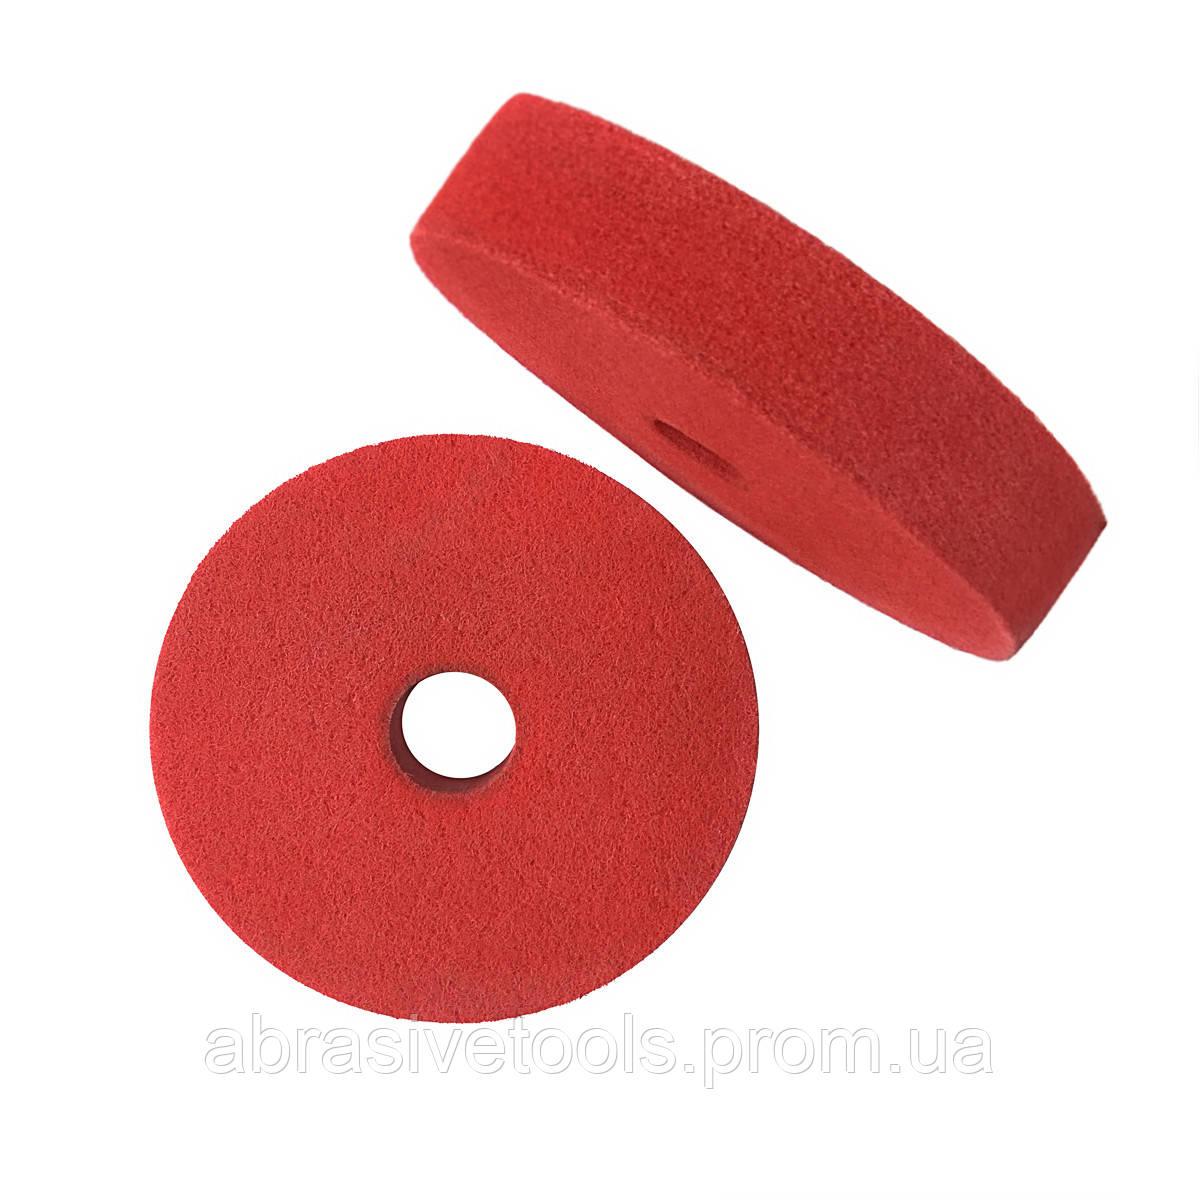 Абразивный диск скотч-брайт 200х50х32 F240 красный